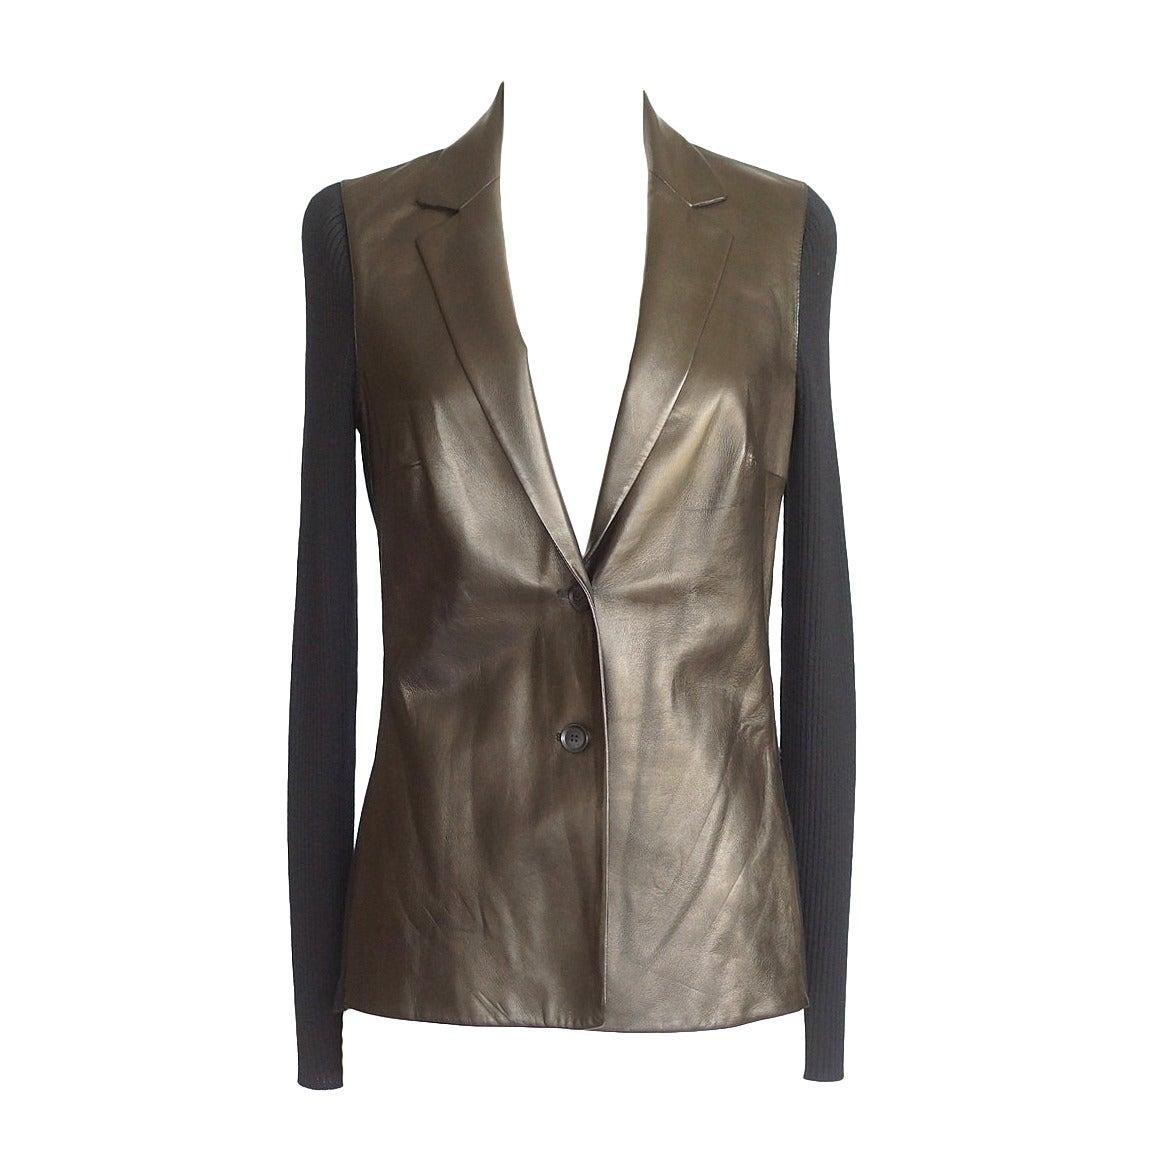 Gucci Cardigan / Jacket Gunmetal Lambskin Front and Black Wool M